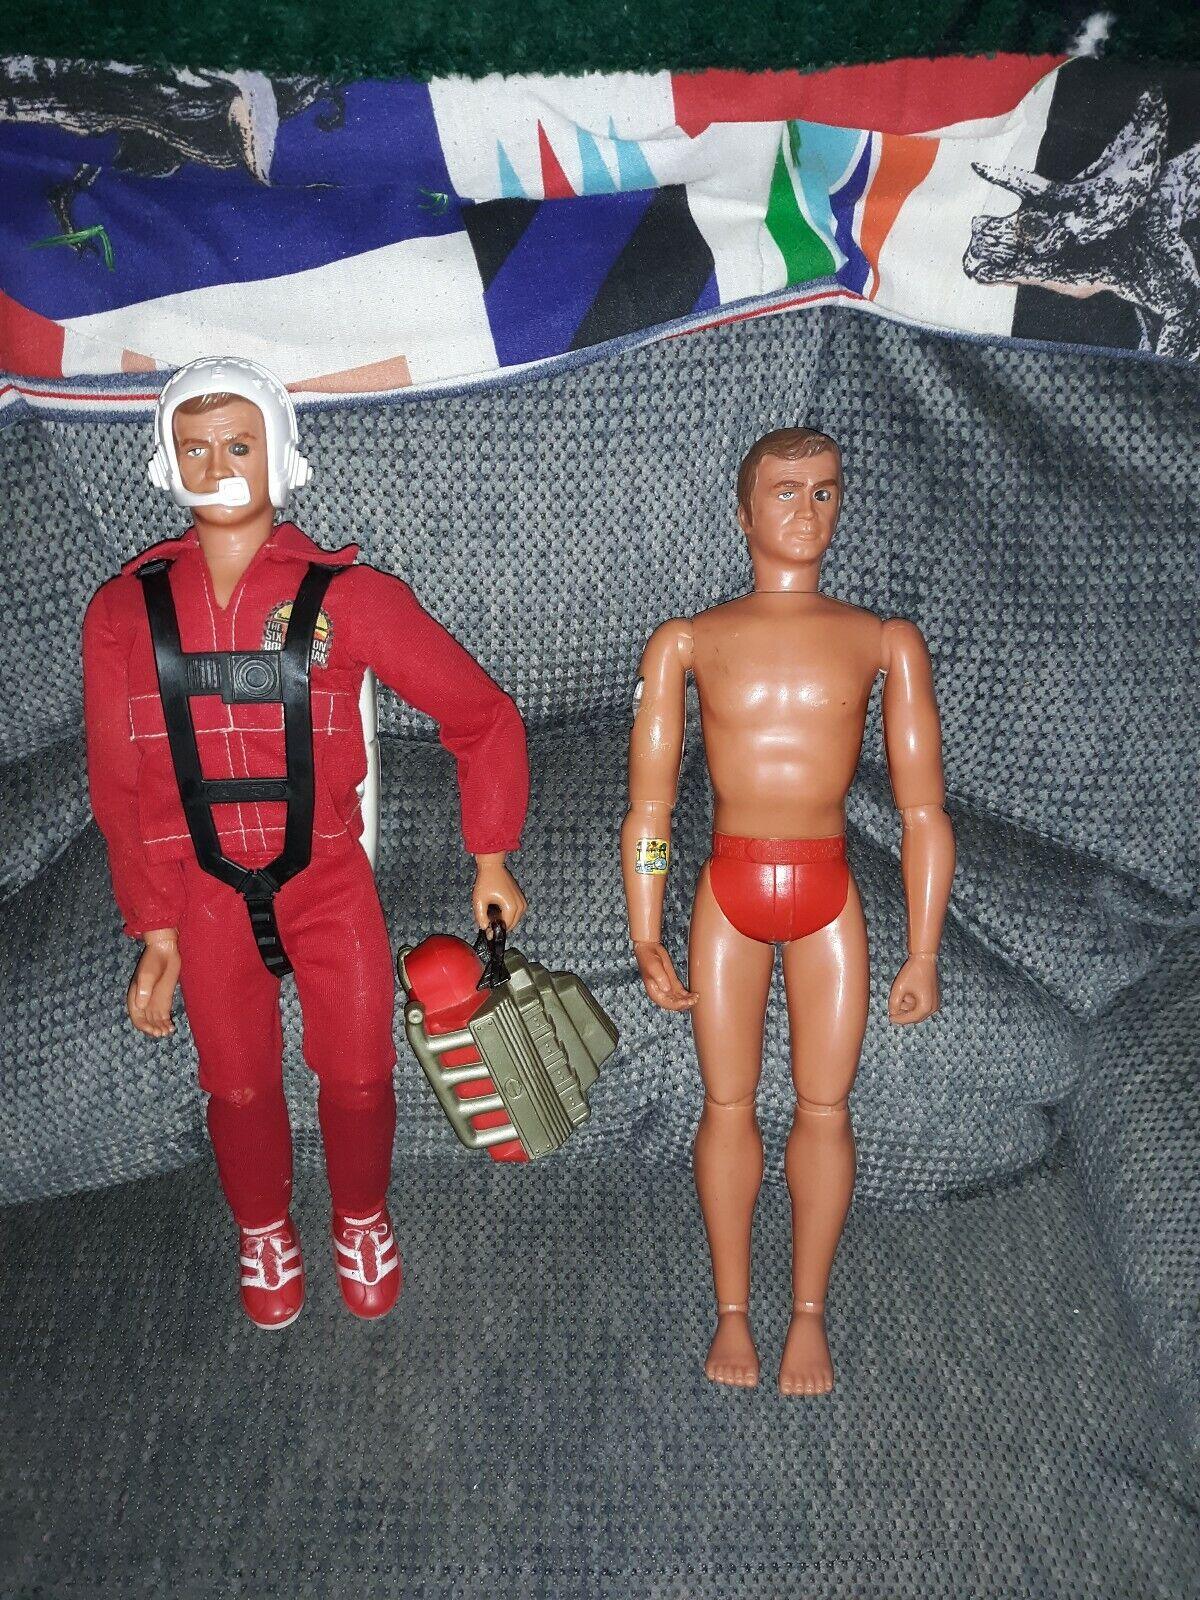 venta Vintage Vintage Vintage 1977 Six Million Dollar Man KENNER Bionic Man Steve Austin  aquí tiene la última